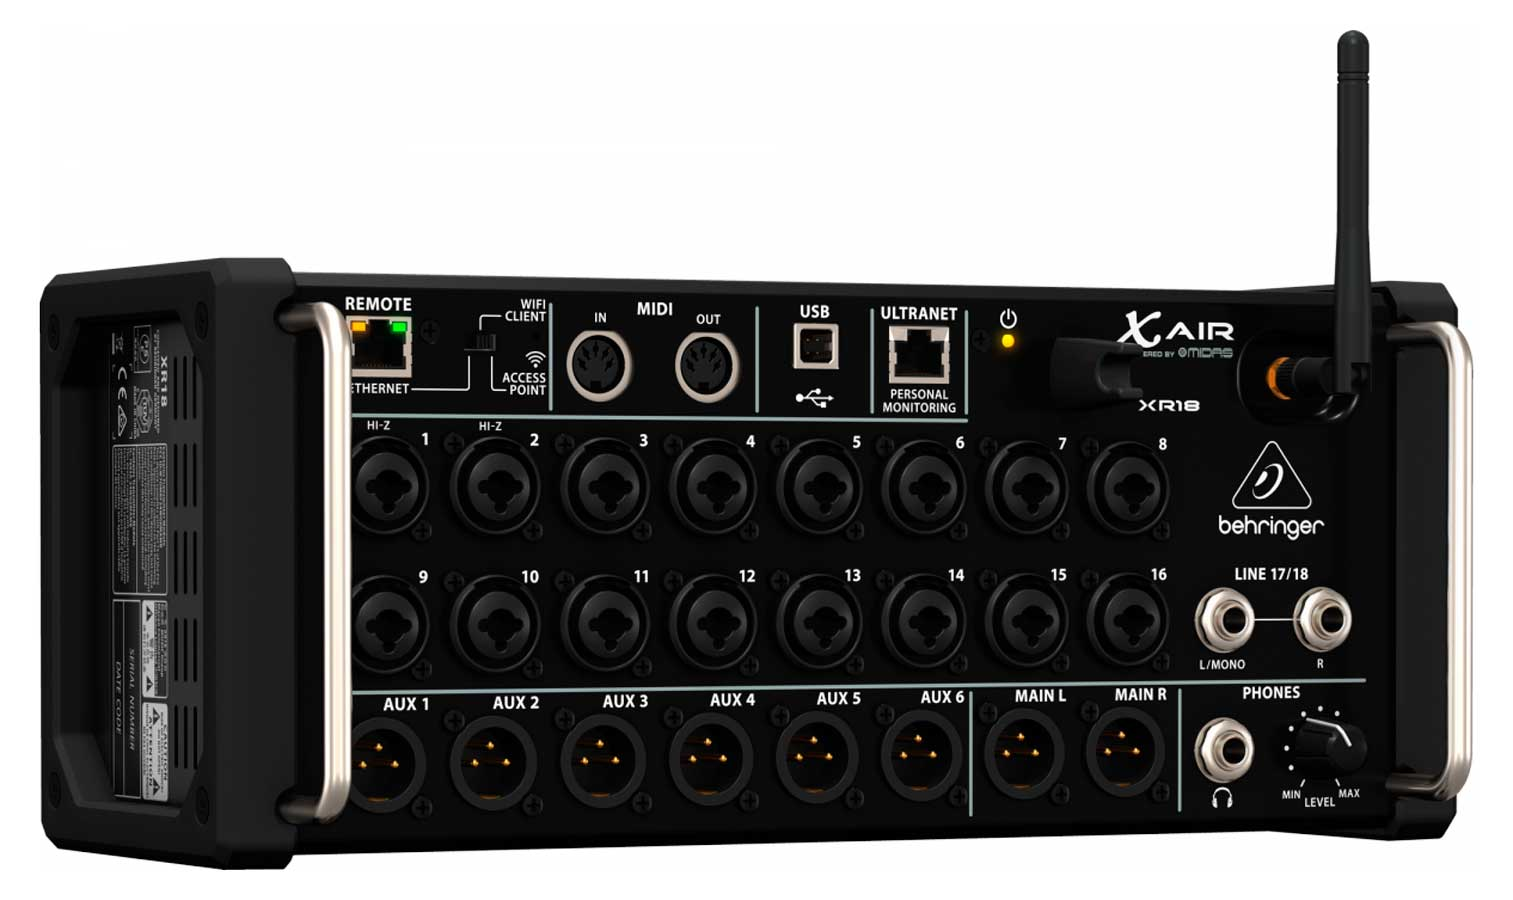 Mesa digital 18 canais 6 AUX - Tablet - Smartphone Behringer XR18